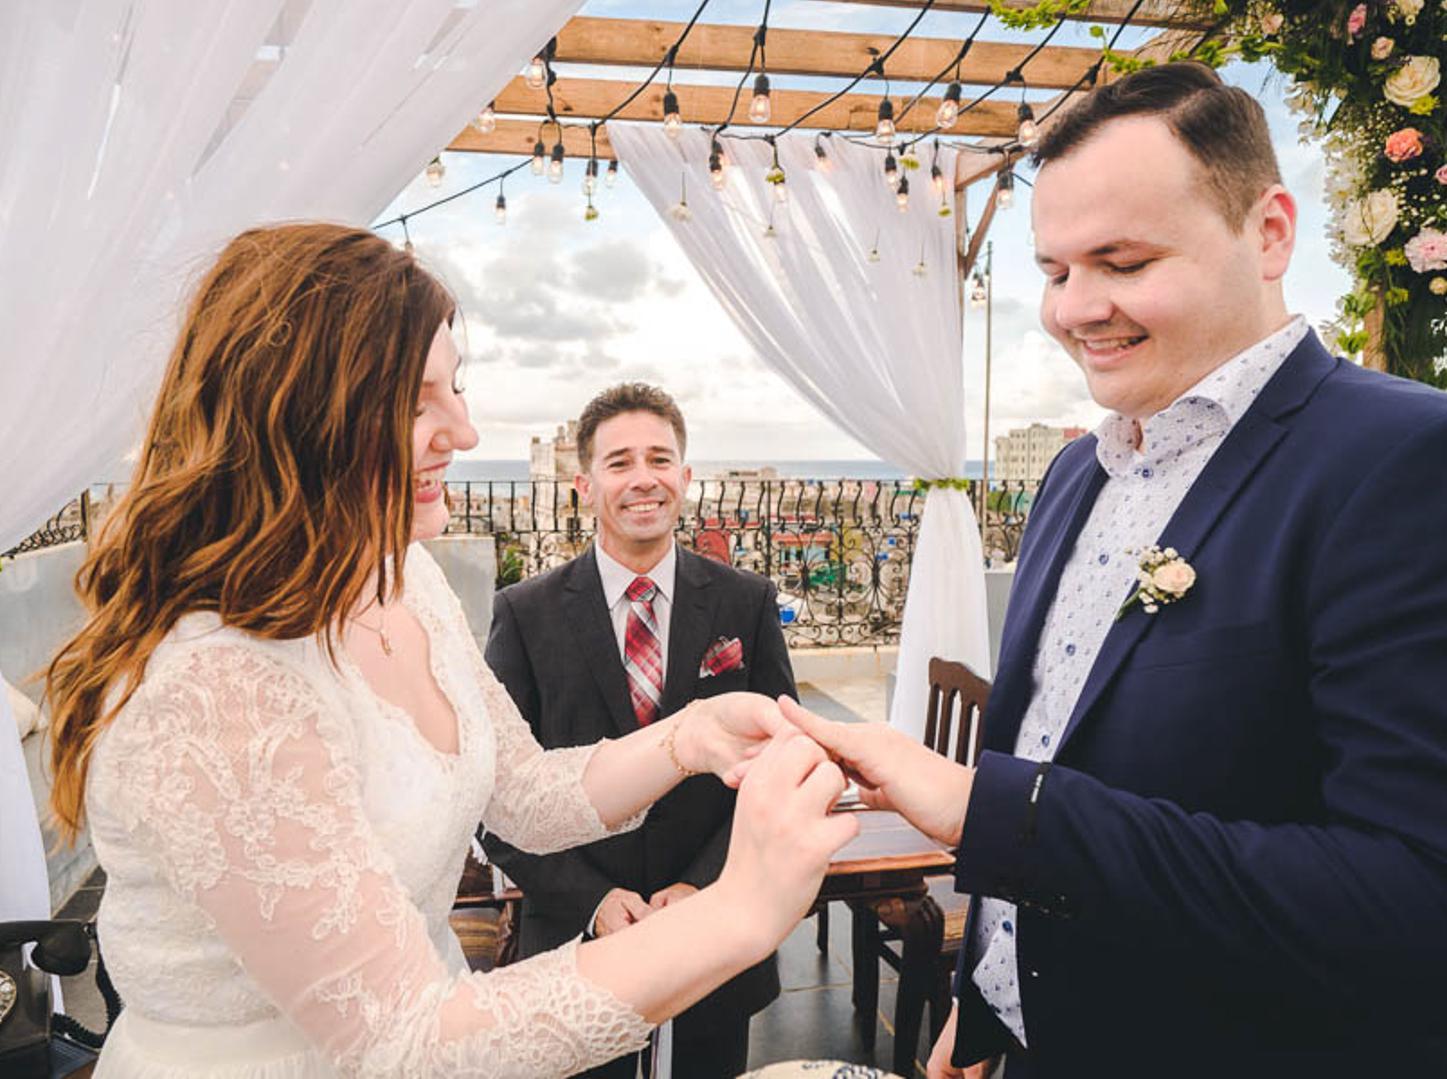 bodas-sin-clasificar-sin-tema-cuba-42361.jpg